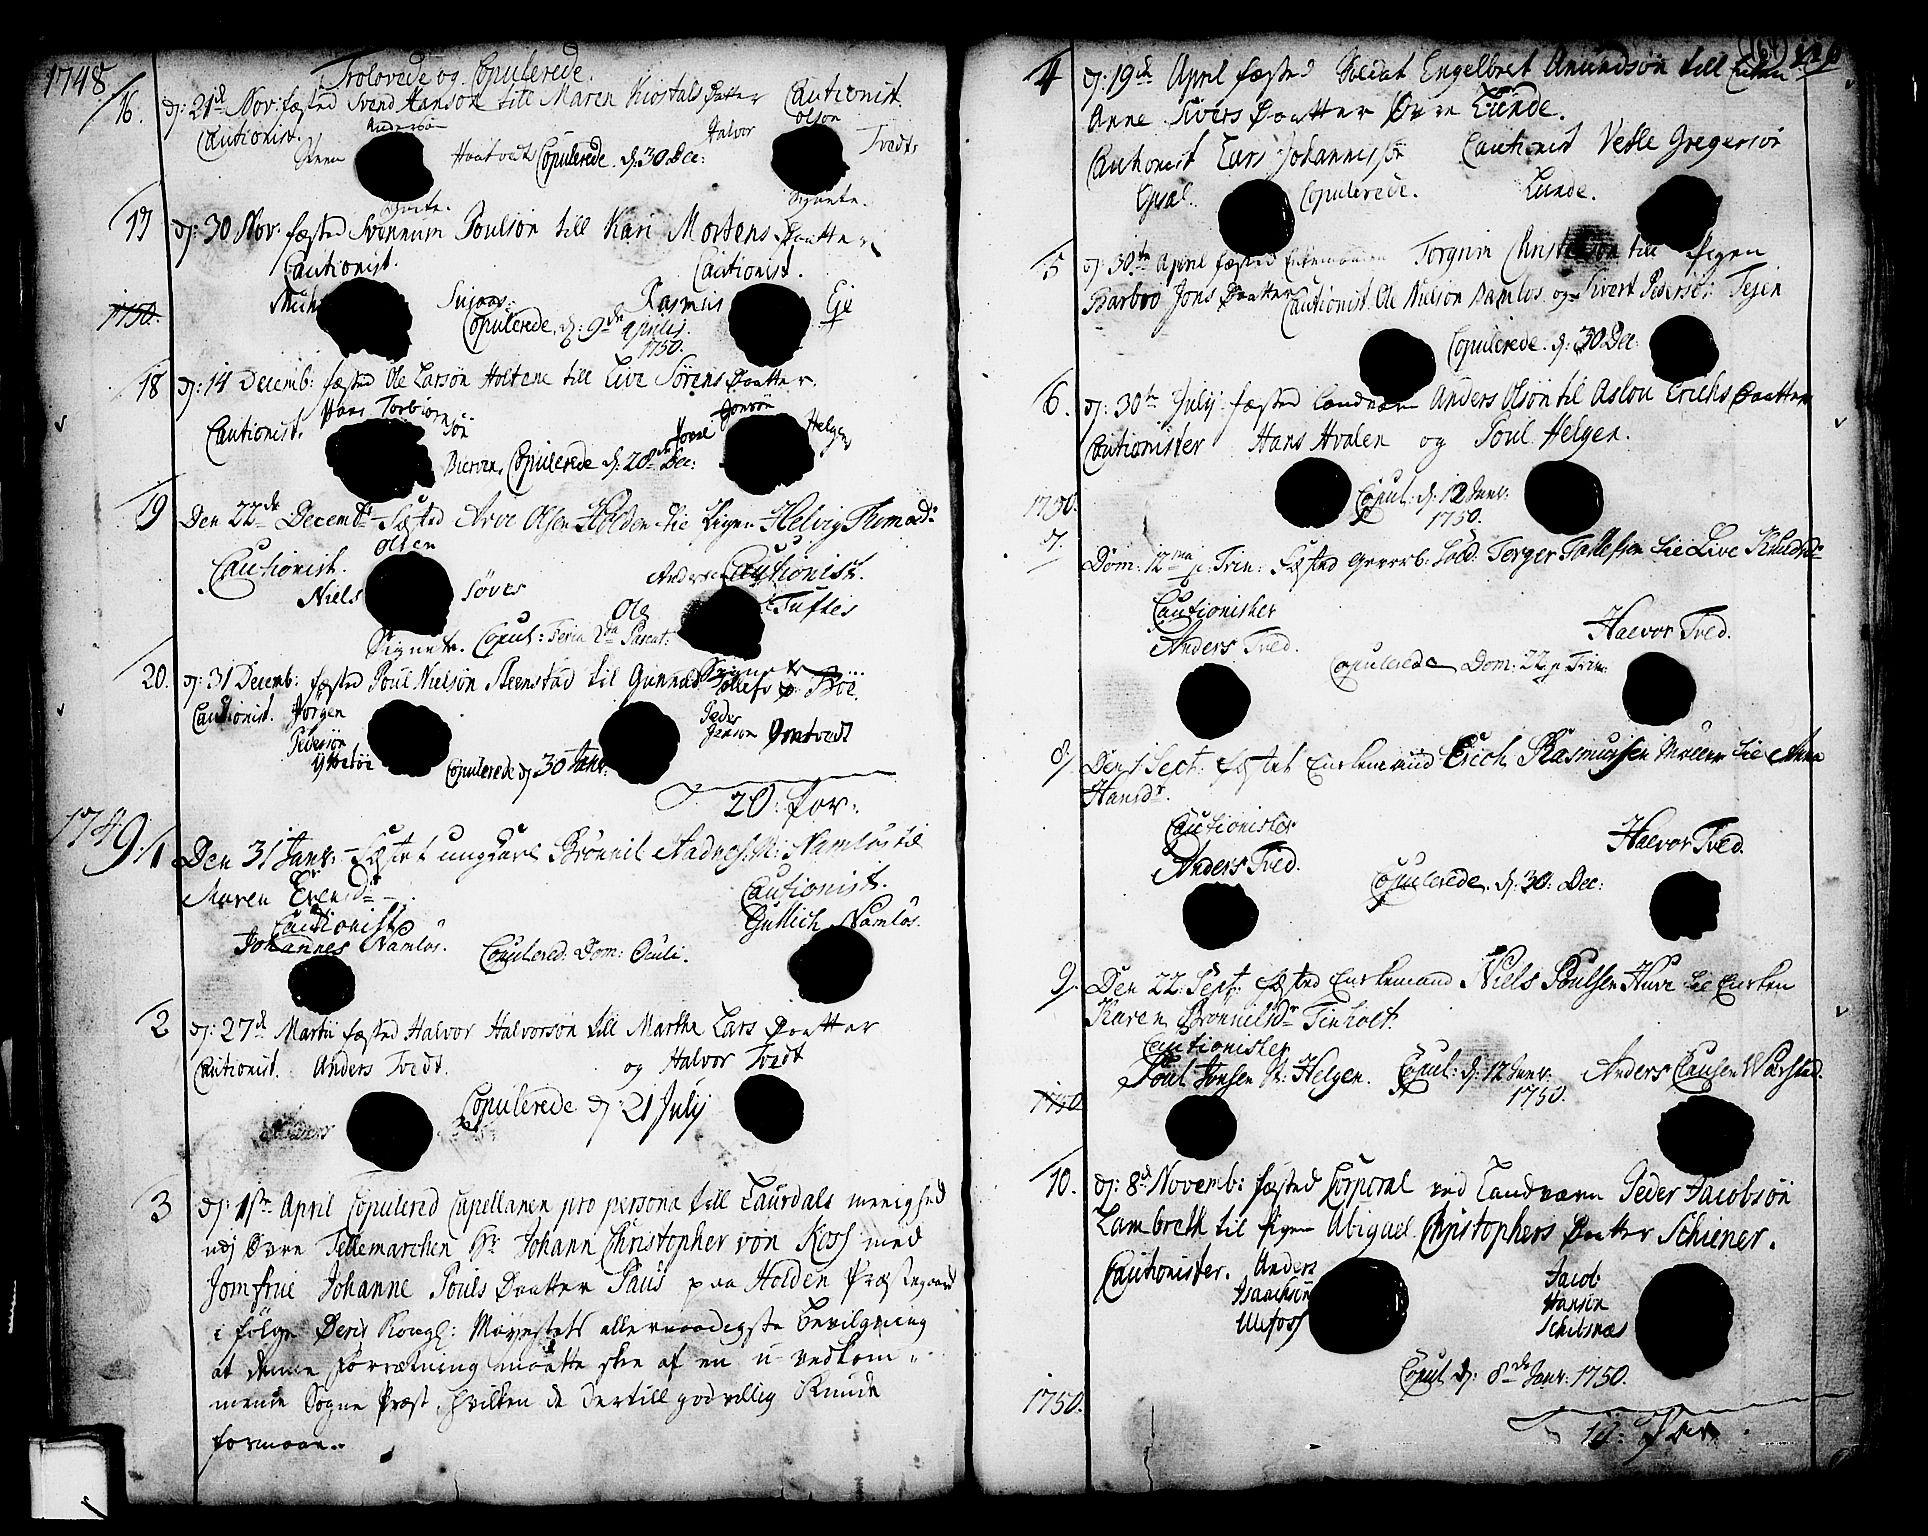 SAKO, Holla kirkebøker, F/Fa/L0001: Ministerialbok nr. 1, 1717-1779, s. 164